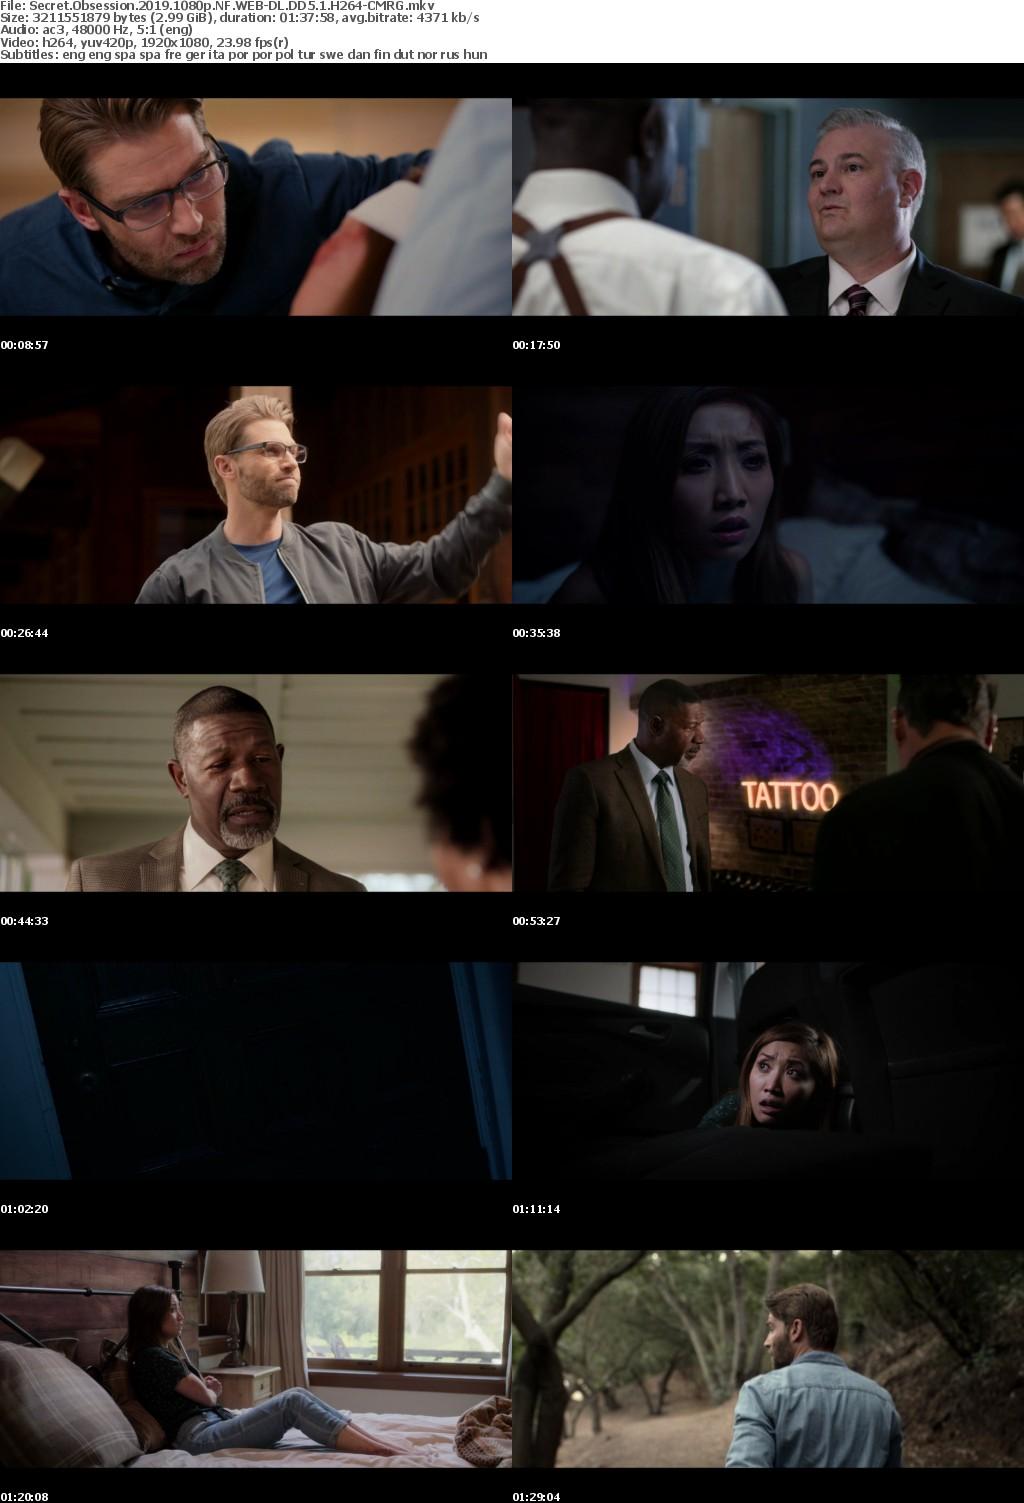 Secret Obsession (2019) 1080p NF WEB DL DD5.1 H264 CMRG